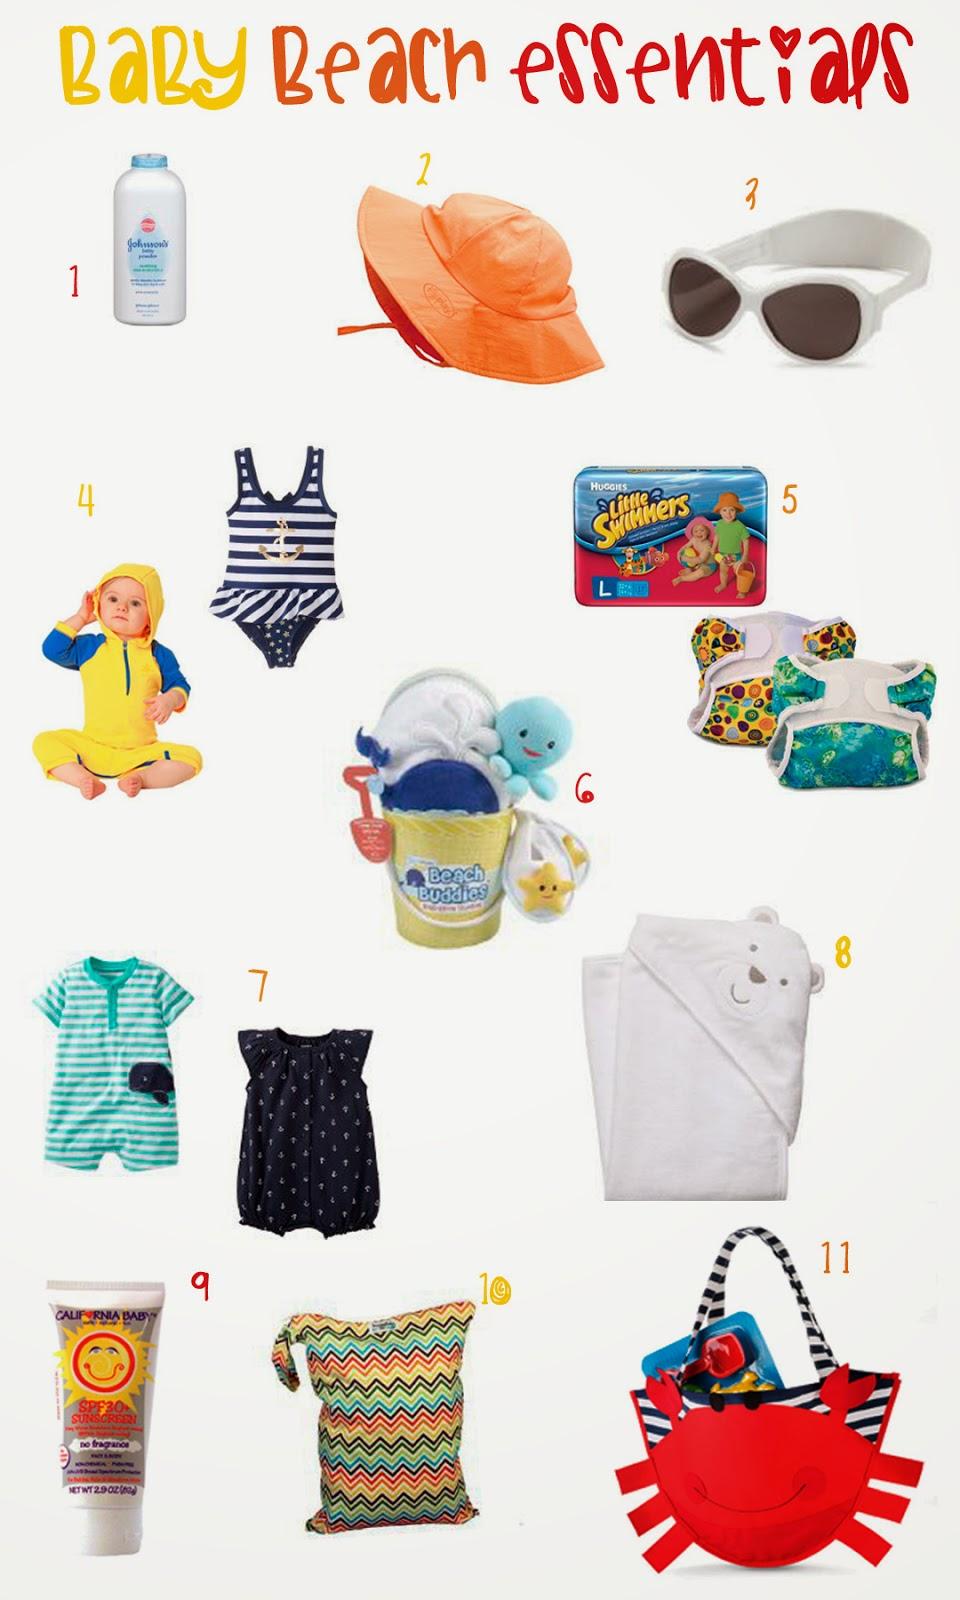 Baby Beach Essentials, Summer baby products